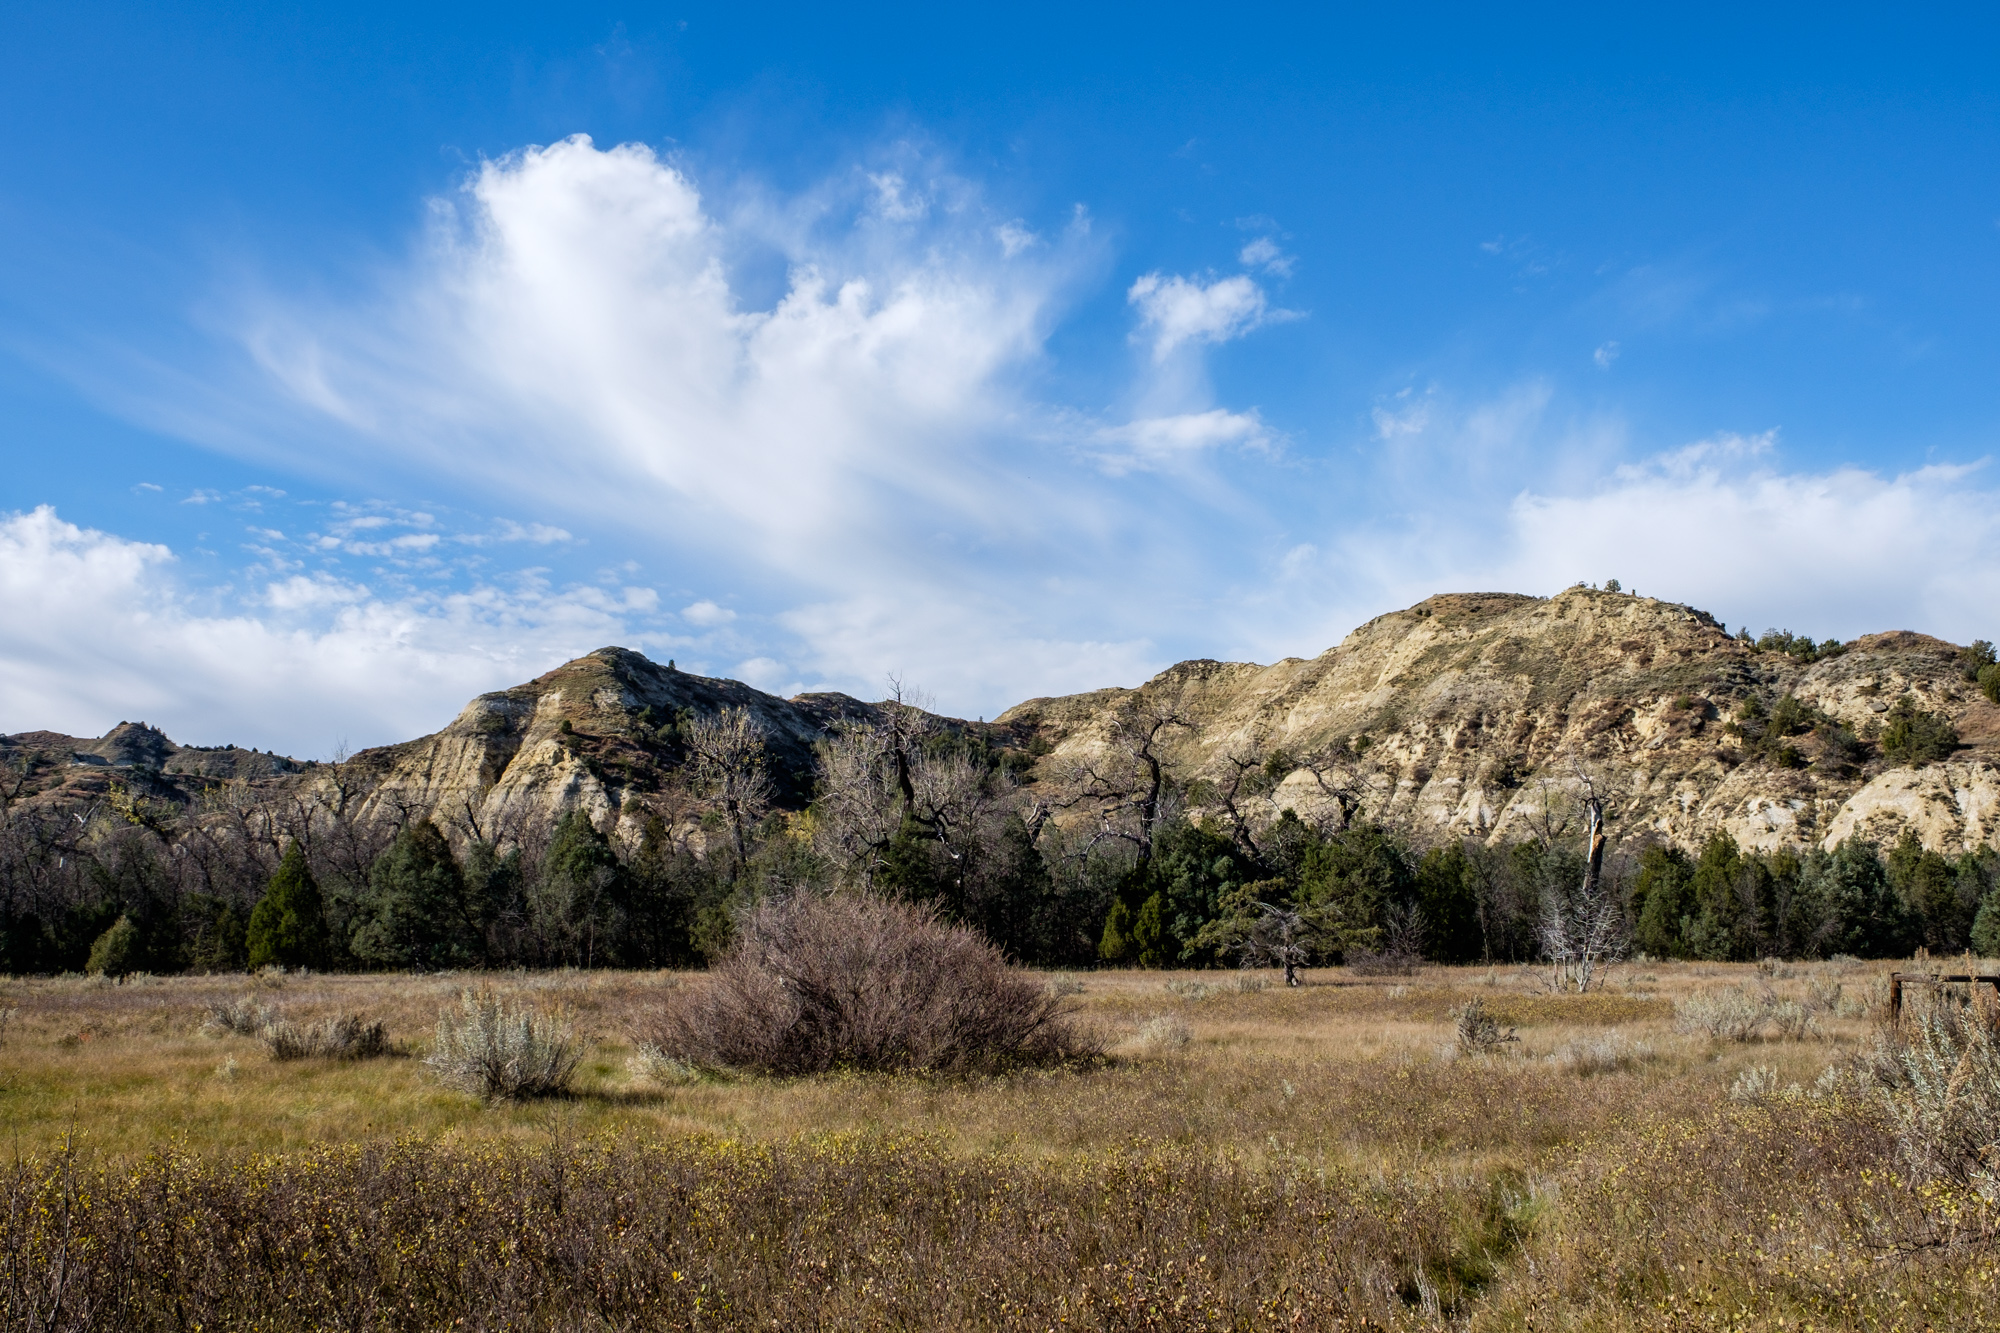 Teddy Roosevelt's backyard at Elkhorn Ranch.